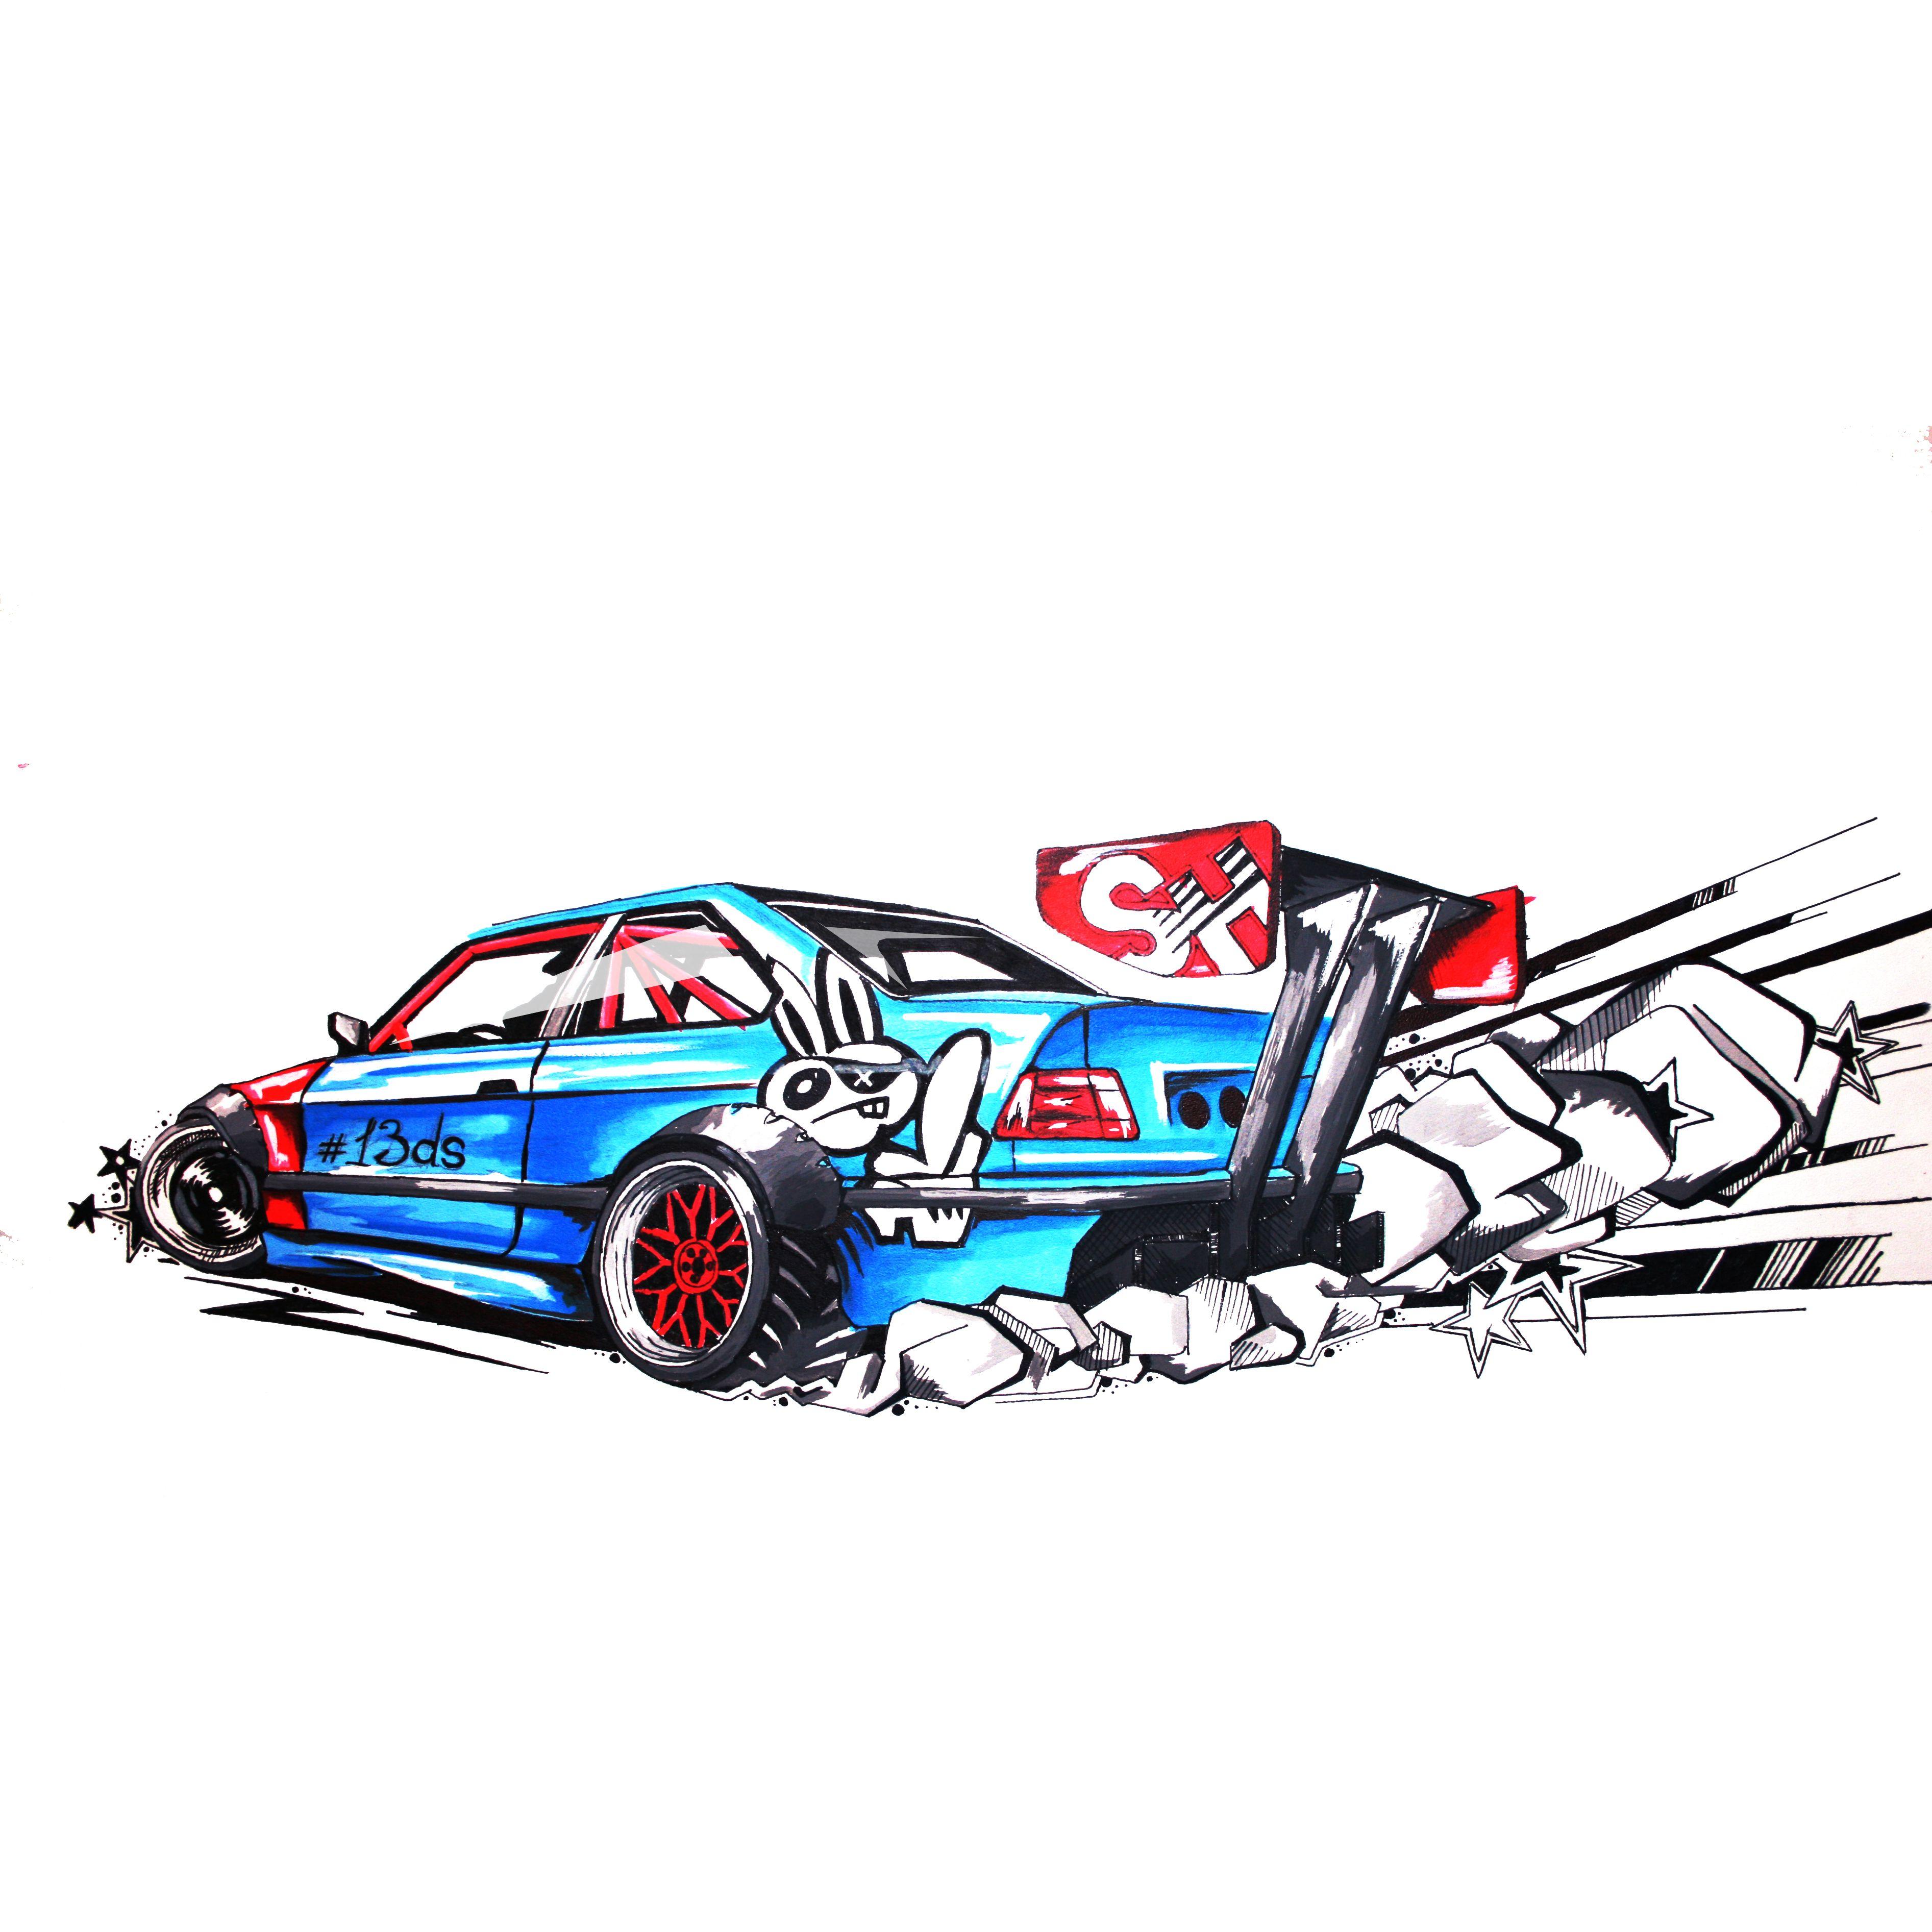 Wide Body Bmw Drift Car Illustration My Illustration